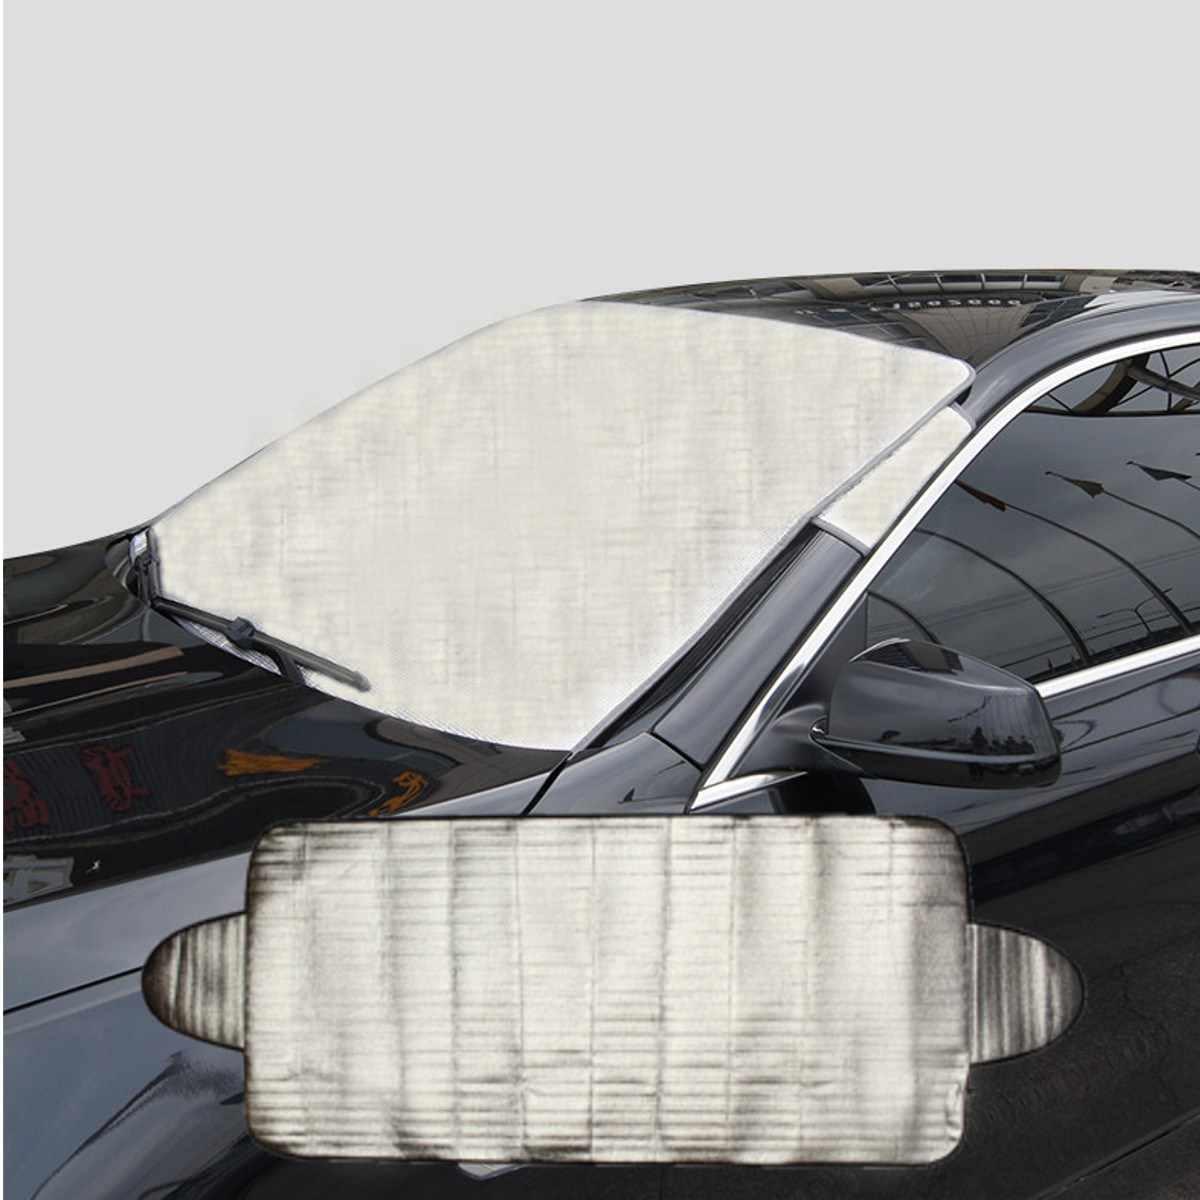 Parasol para parabrisas de coche con cubierta de coche, visera para Smart Forfour Fortwo Roadster Vauxhall Adam Astra Vectra Vxr8